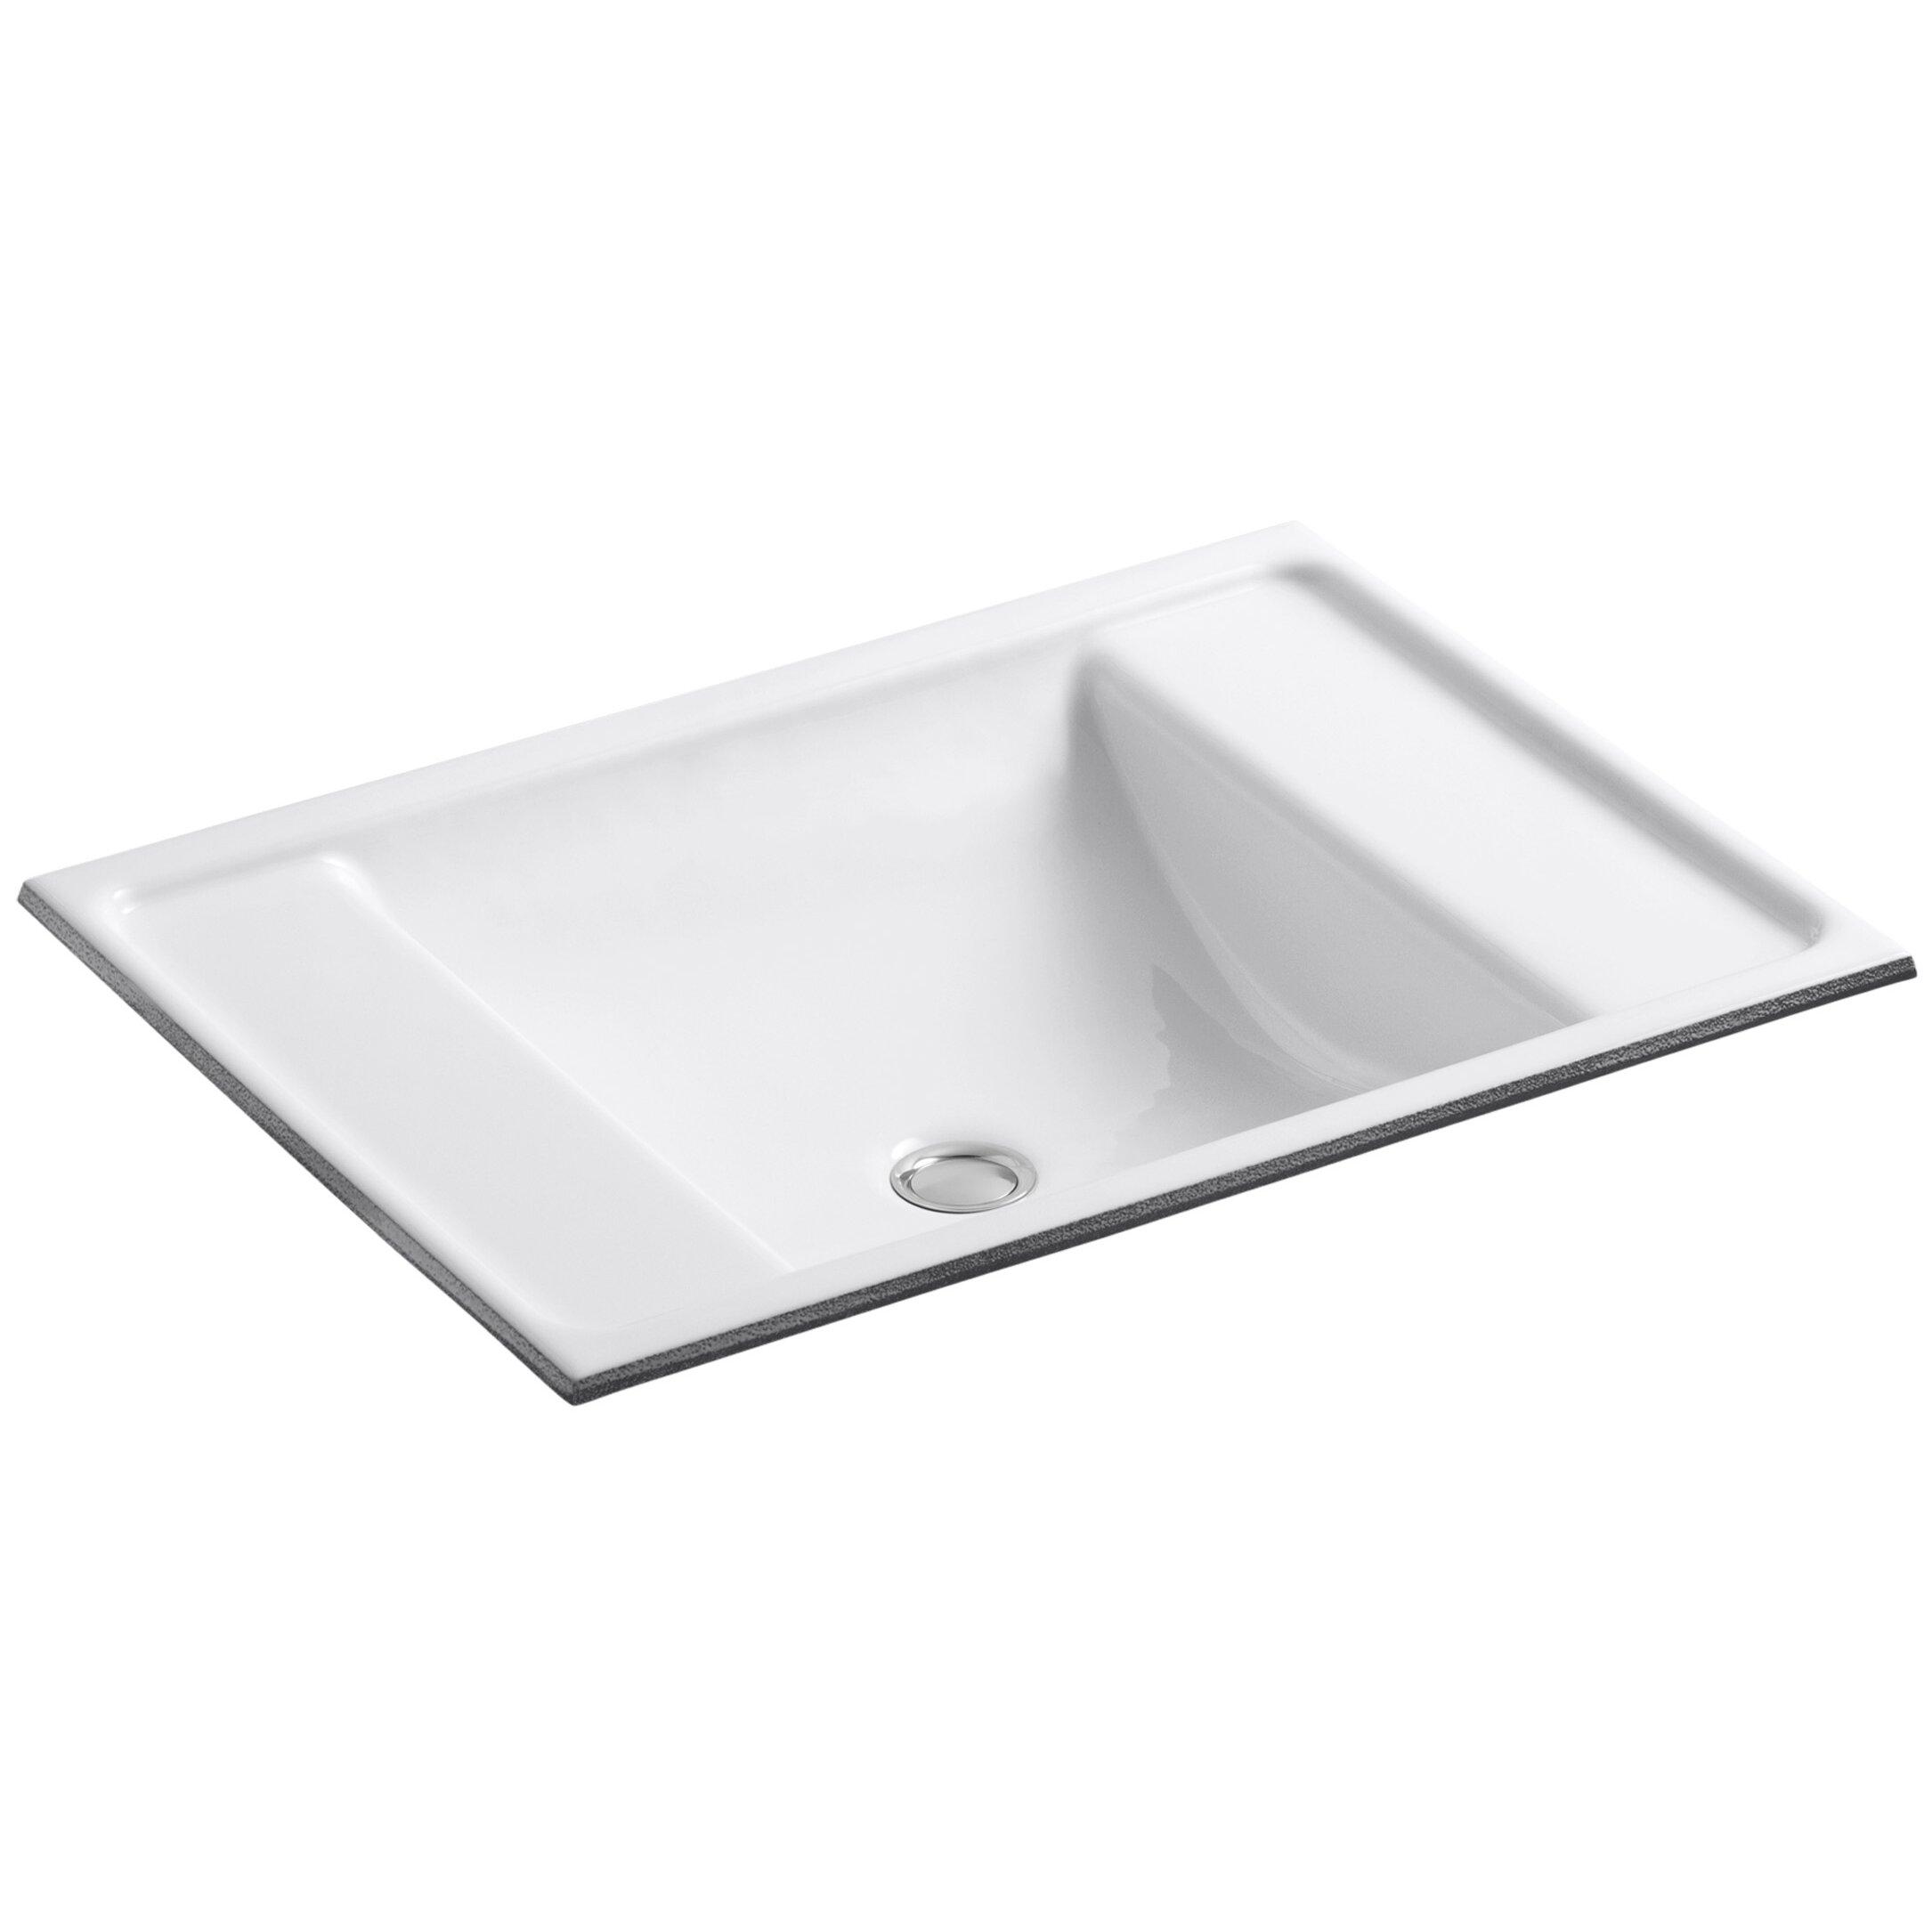 Kohler Ledges Undermount Bathroom Sink & Reviews Wayfair